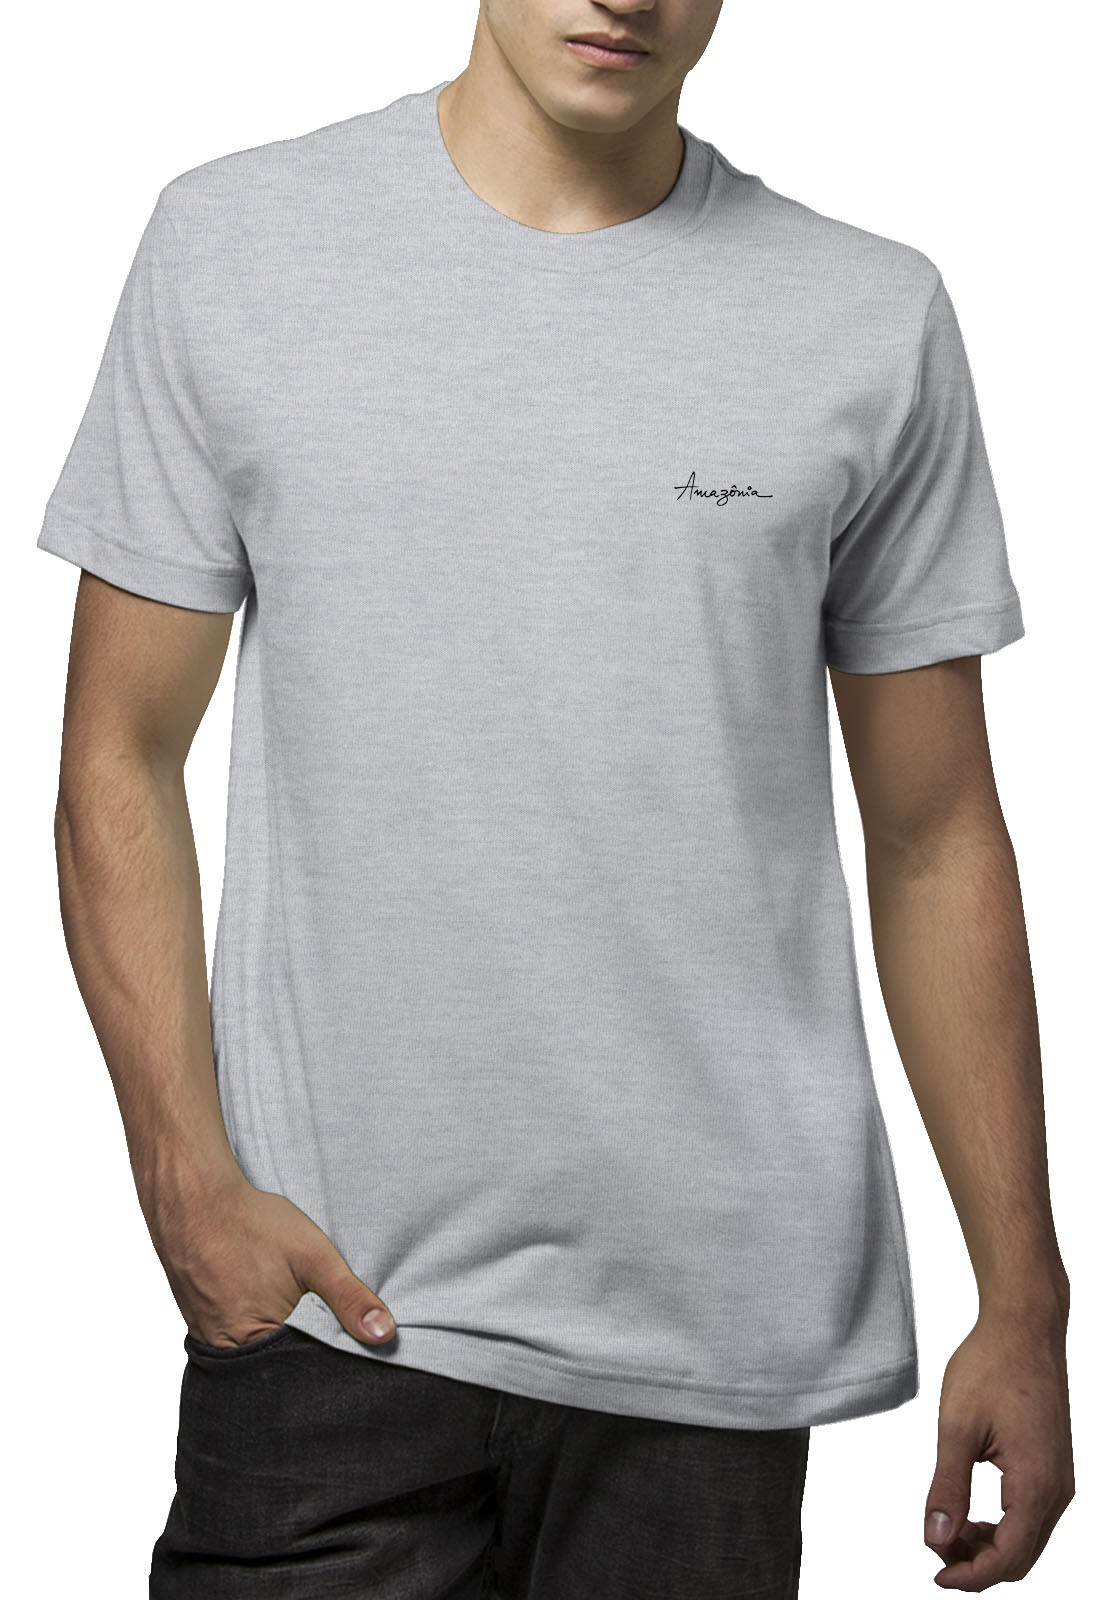 Camiseta Amazônia Beija Flor - Mescla Claro